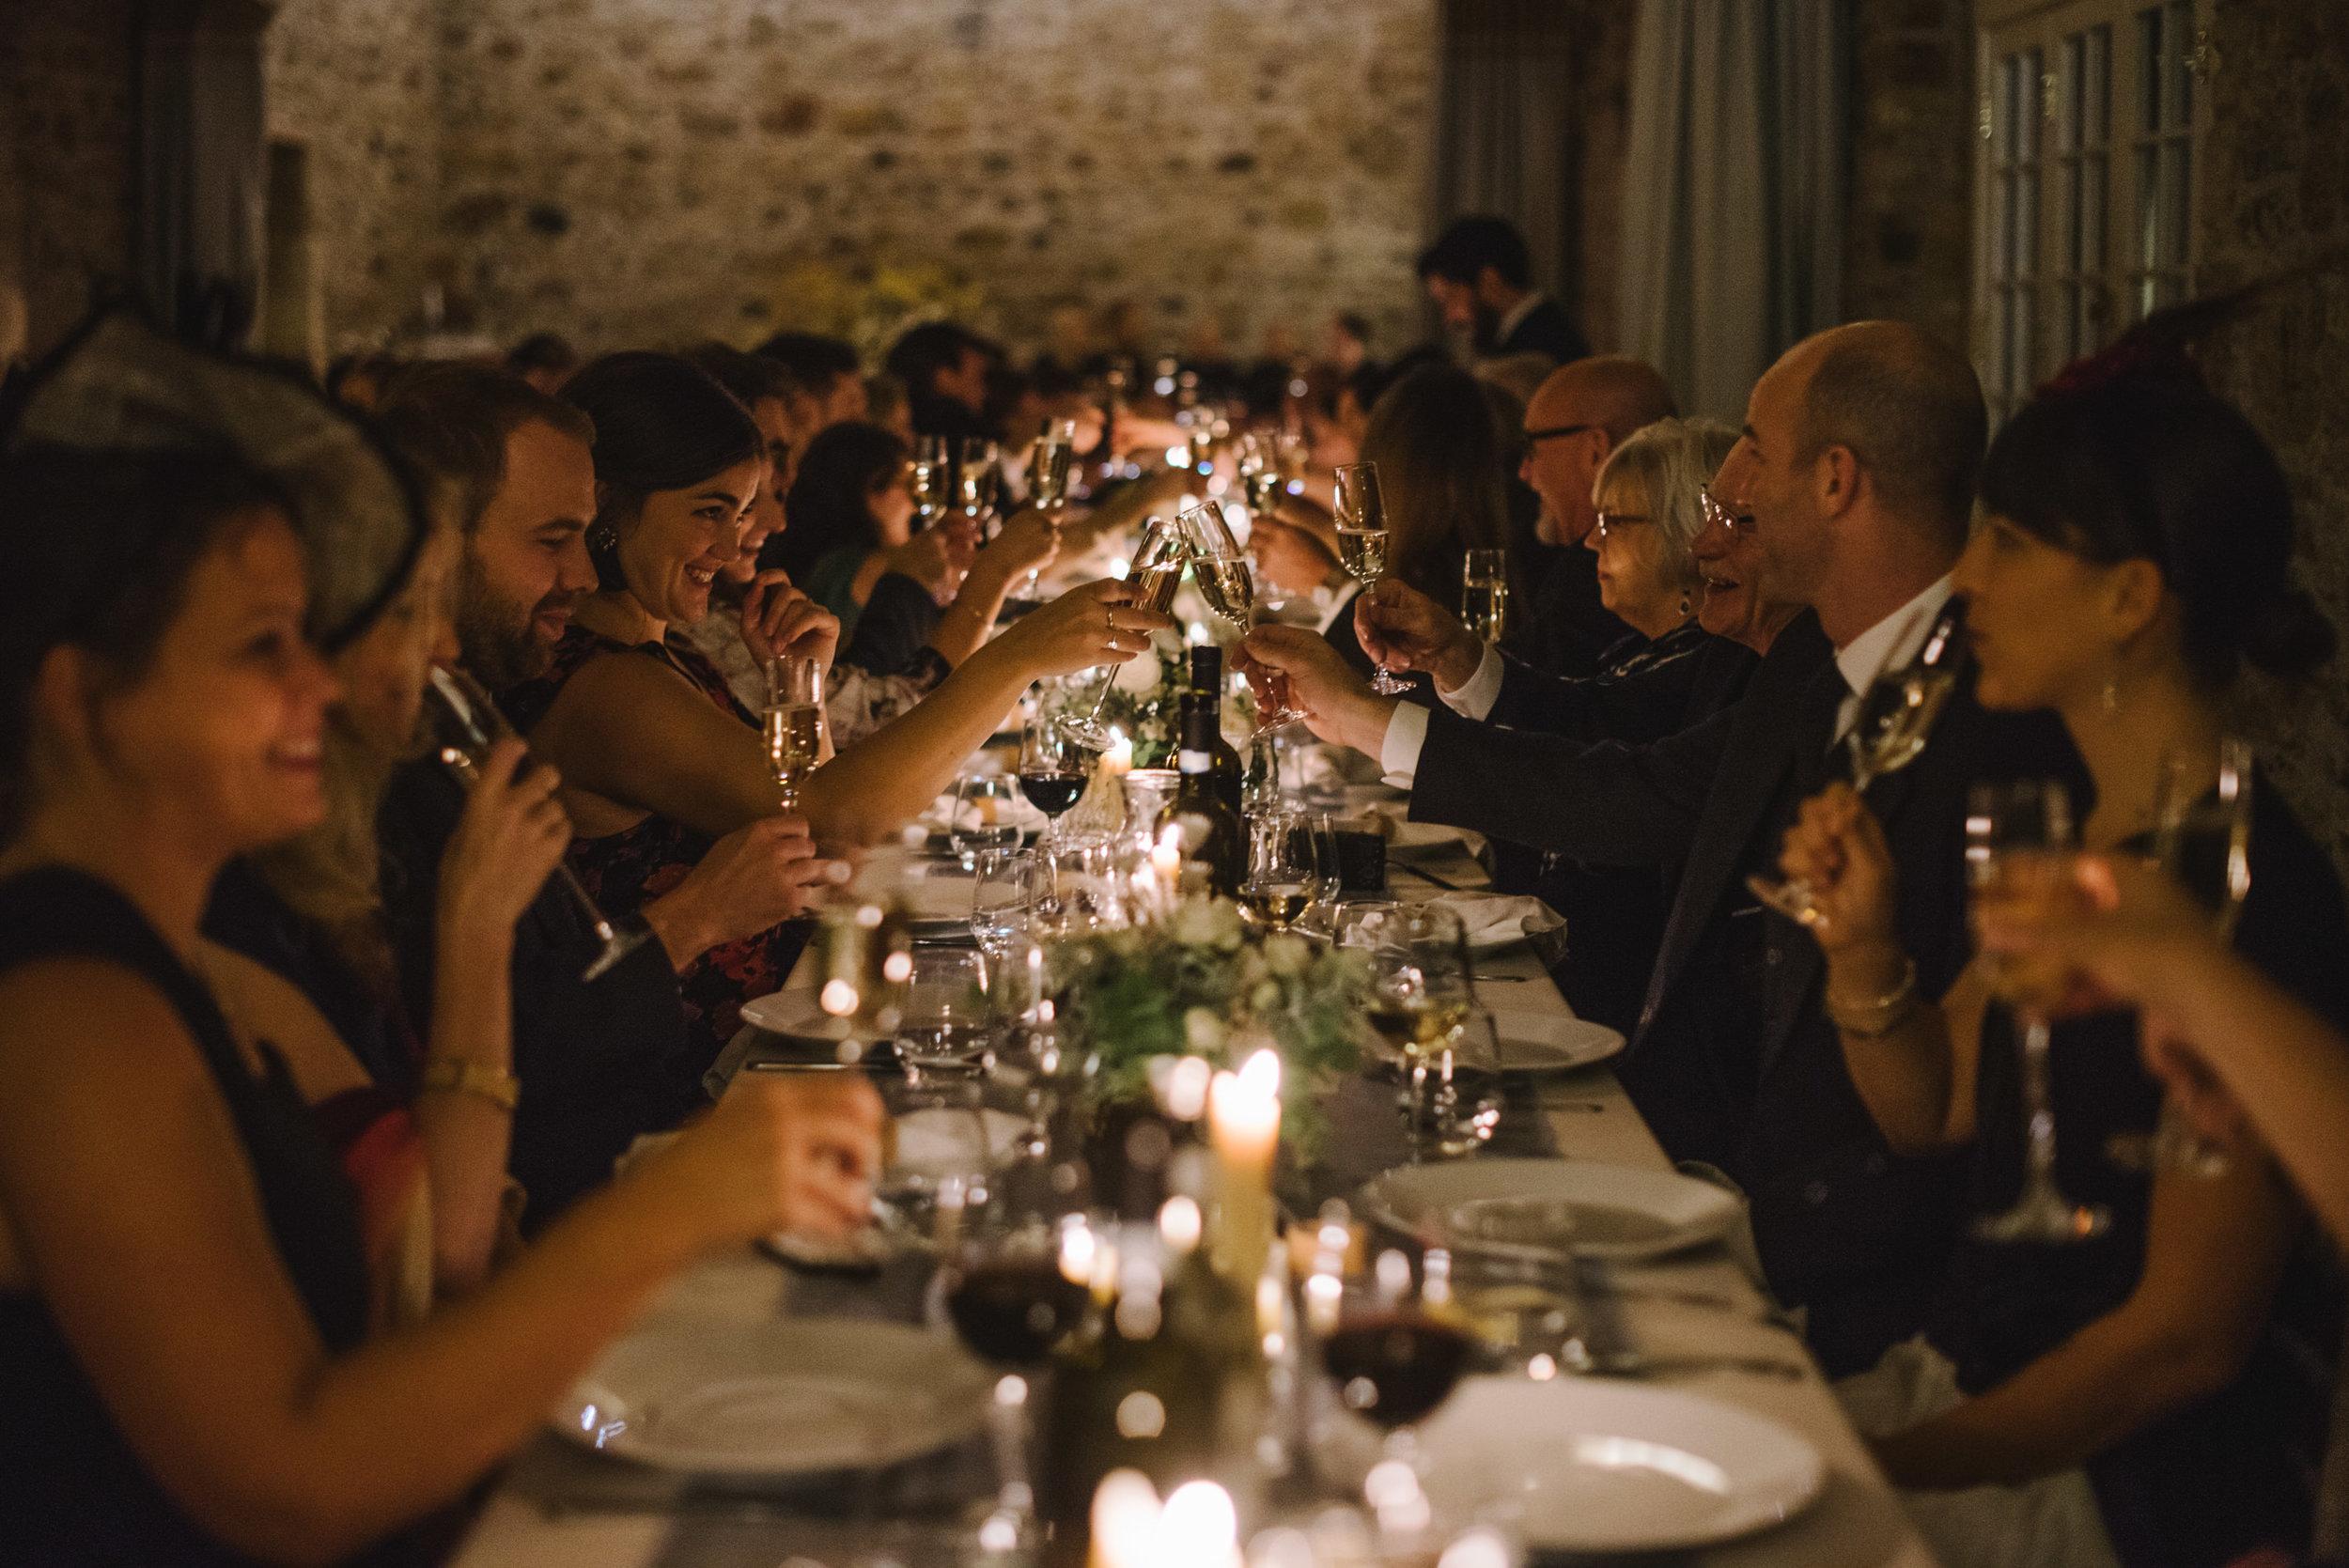 0192-LISA-DEVINE-PHOTOGRAPHY-ALTERNATIVE-WEDDING-PHOTOGRAPHY-SCOTLAND-DESTINATION-WEDDINGS-GLASGOW-WEDDINGS-COOL-WEDDINGS-STYLISH-WEDDINGS.JPG